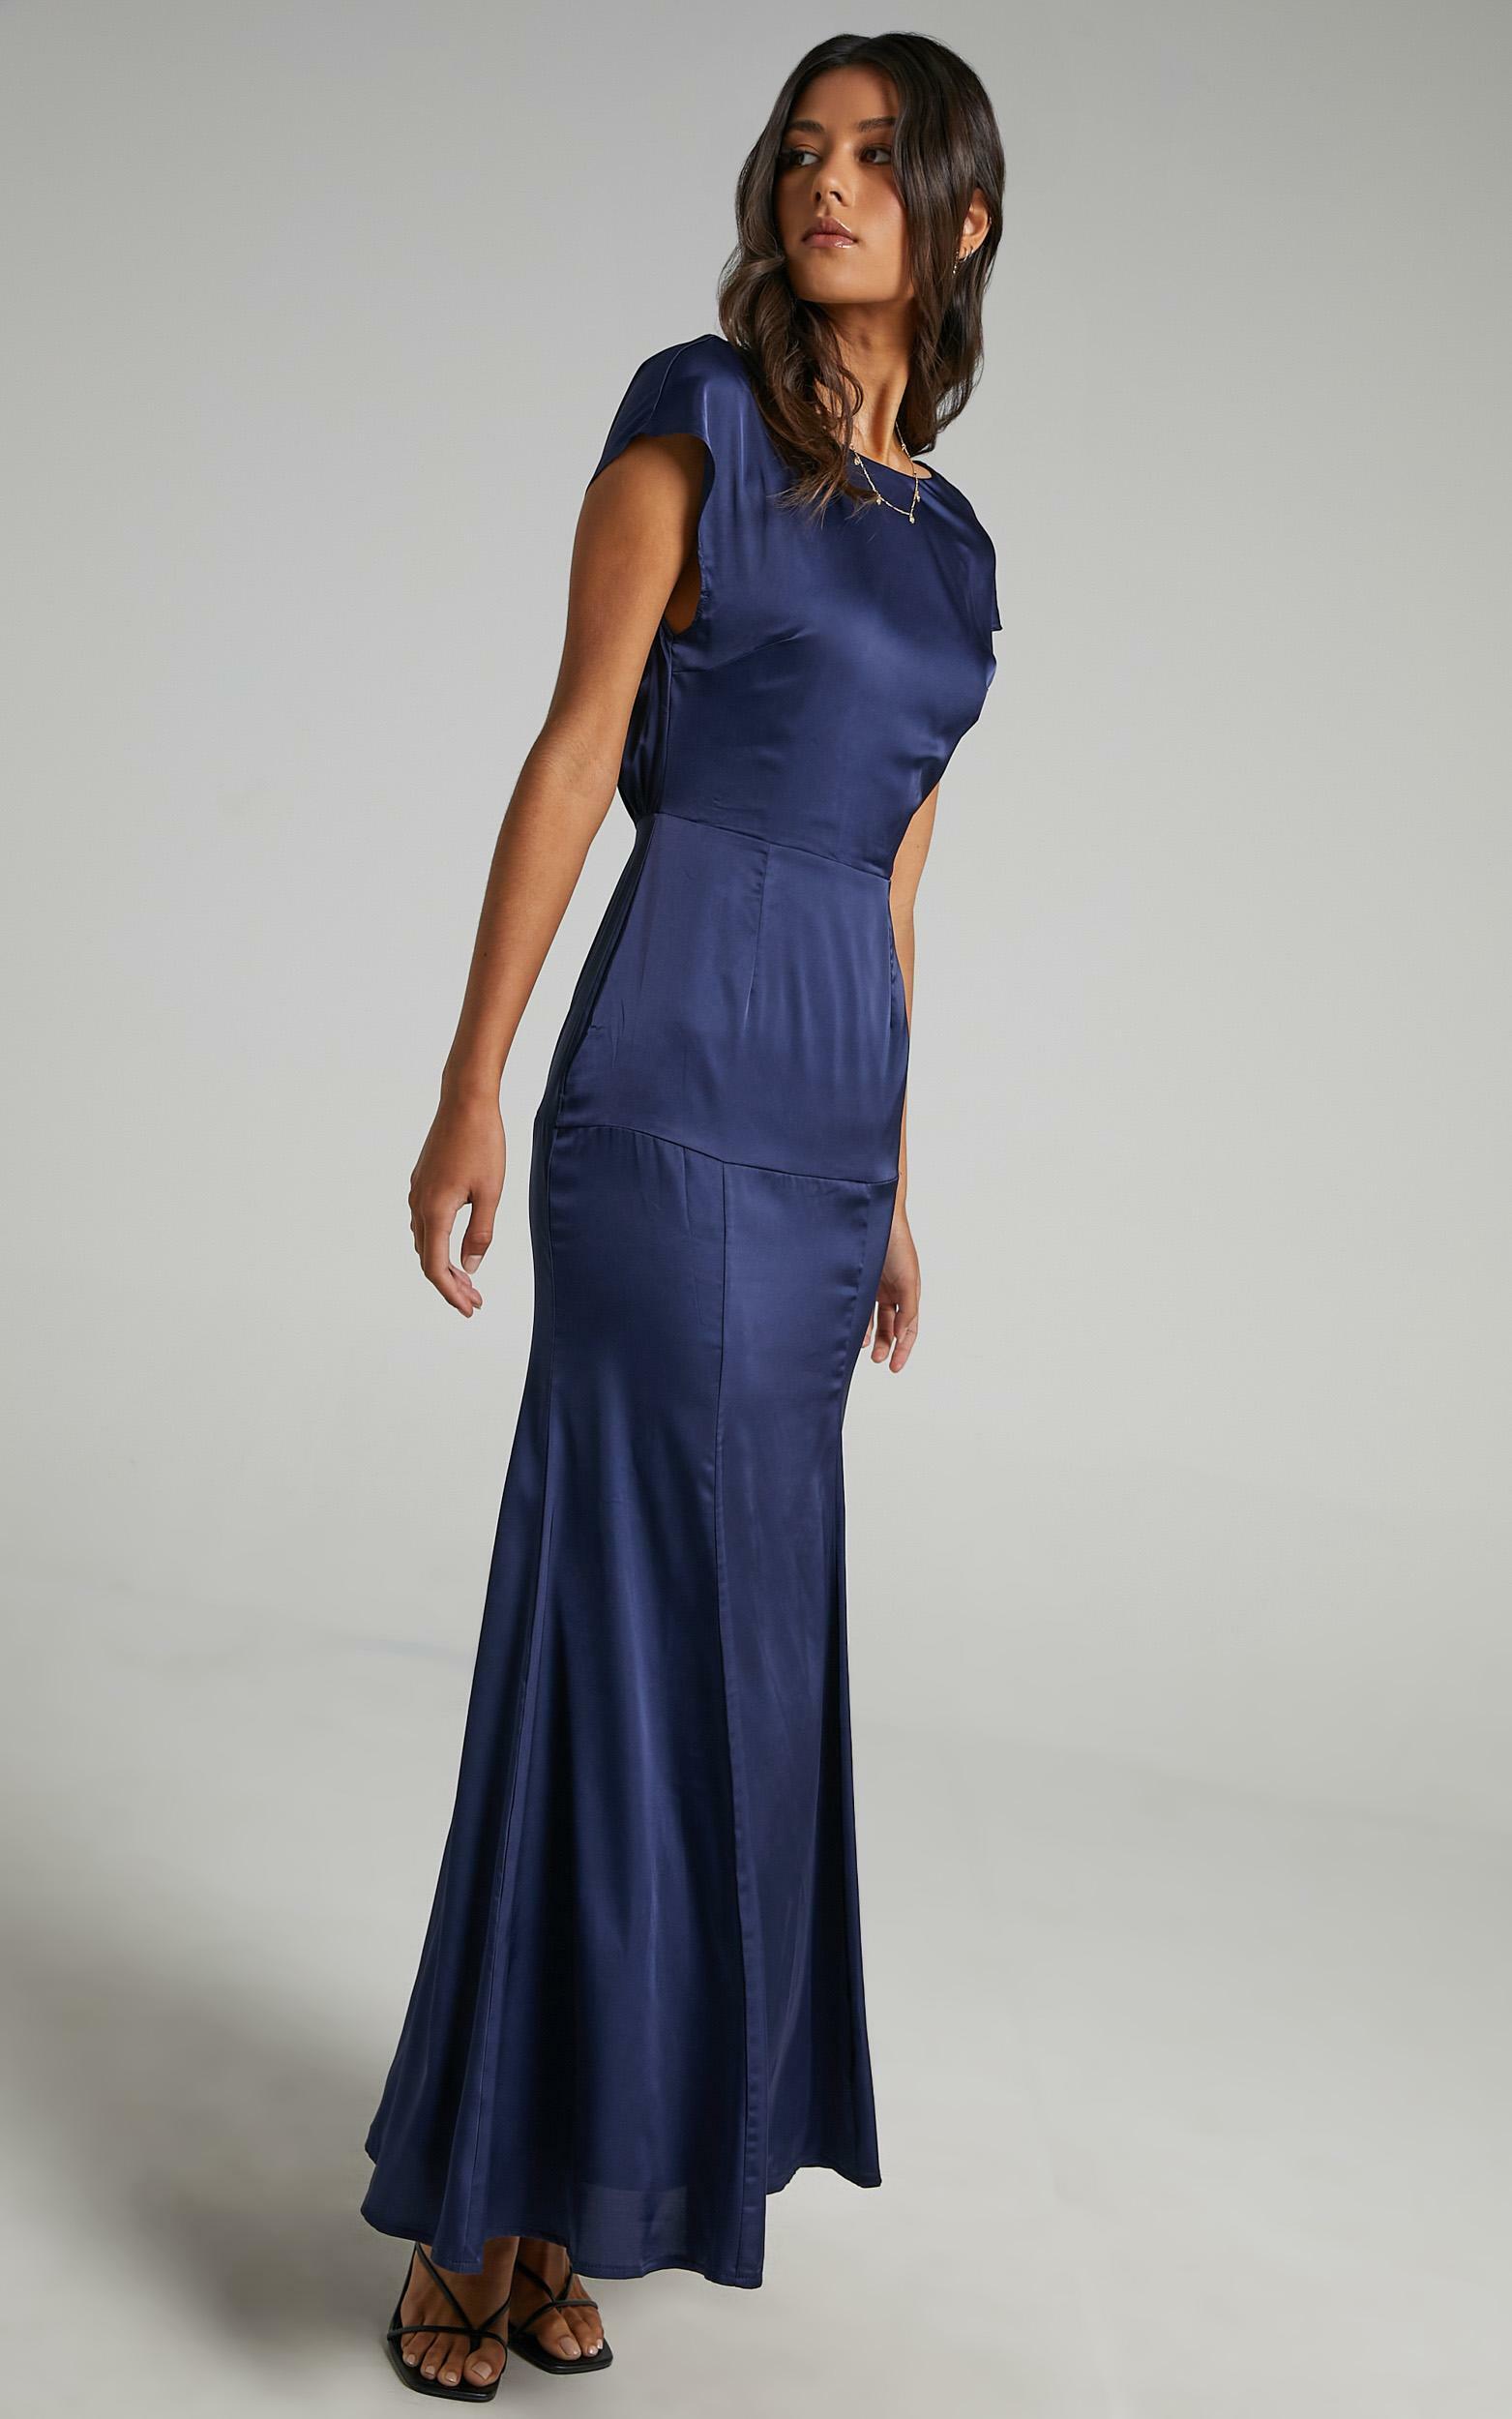 Nour Dress in Navy Satin - 06, NVY2, hi-res image number null